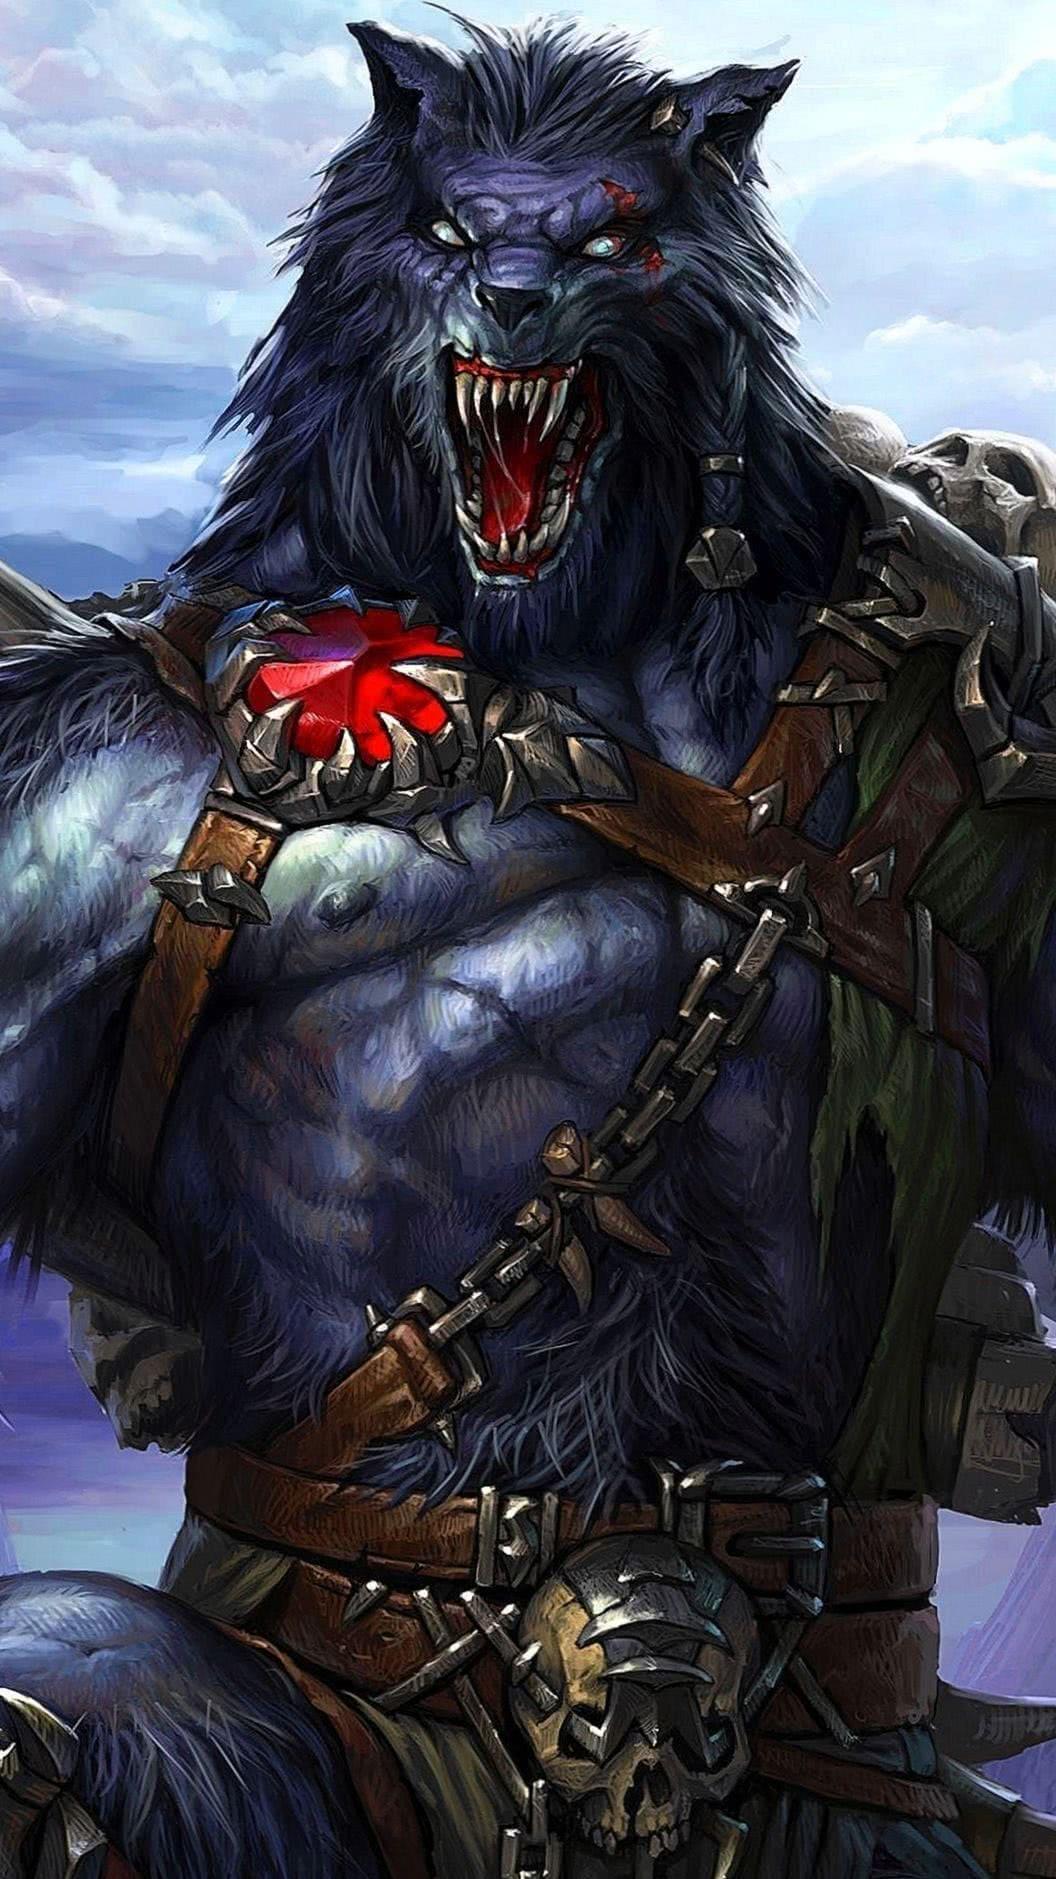 Werewolf Wallpaper For Mobile HD